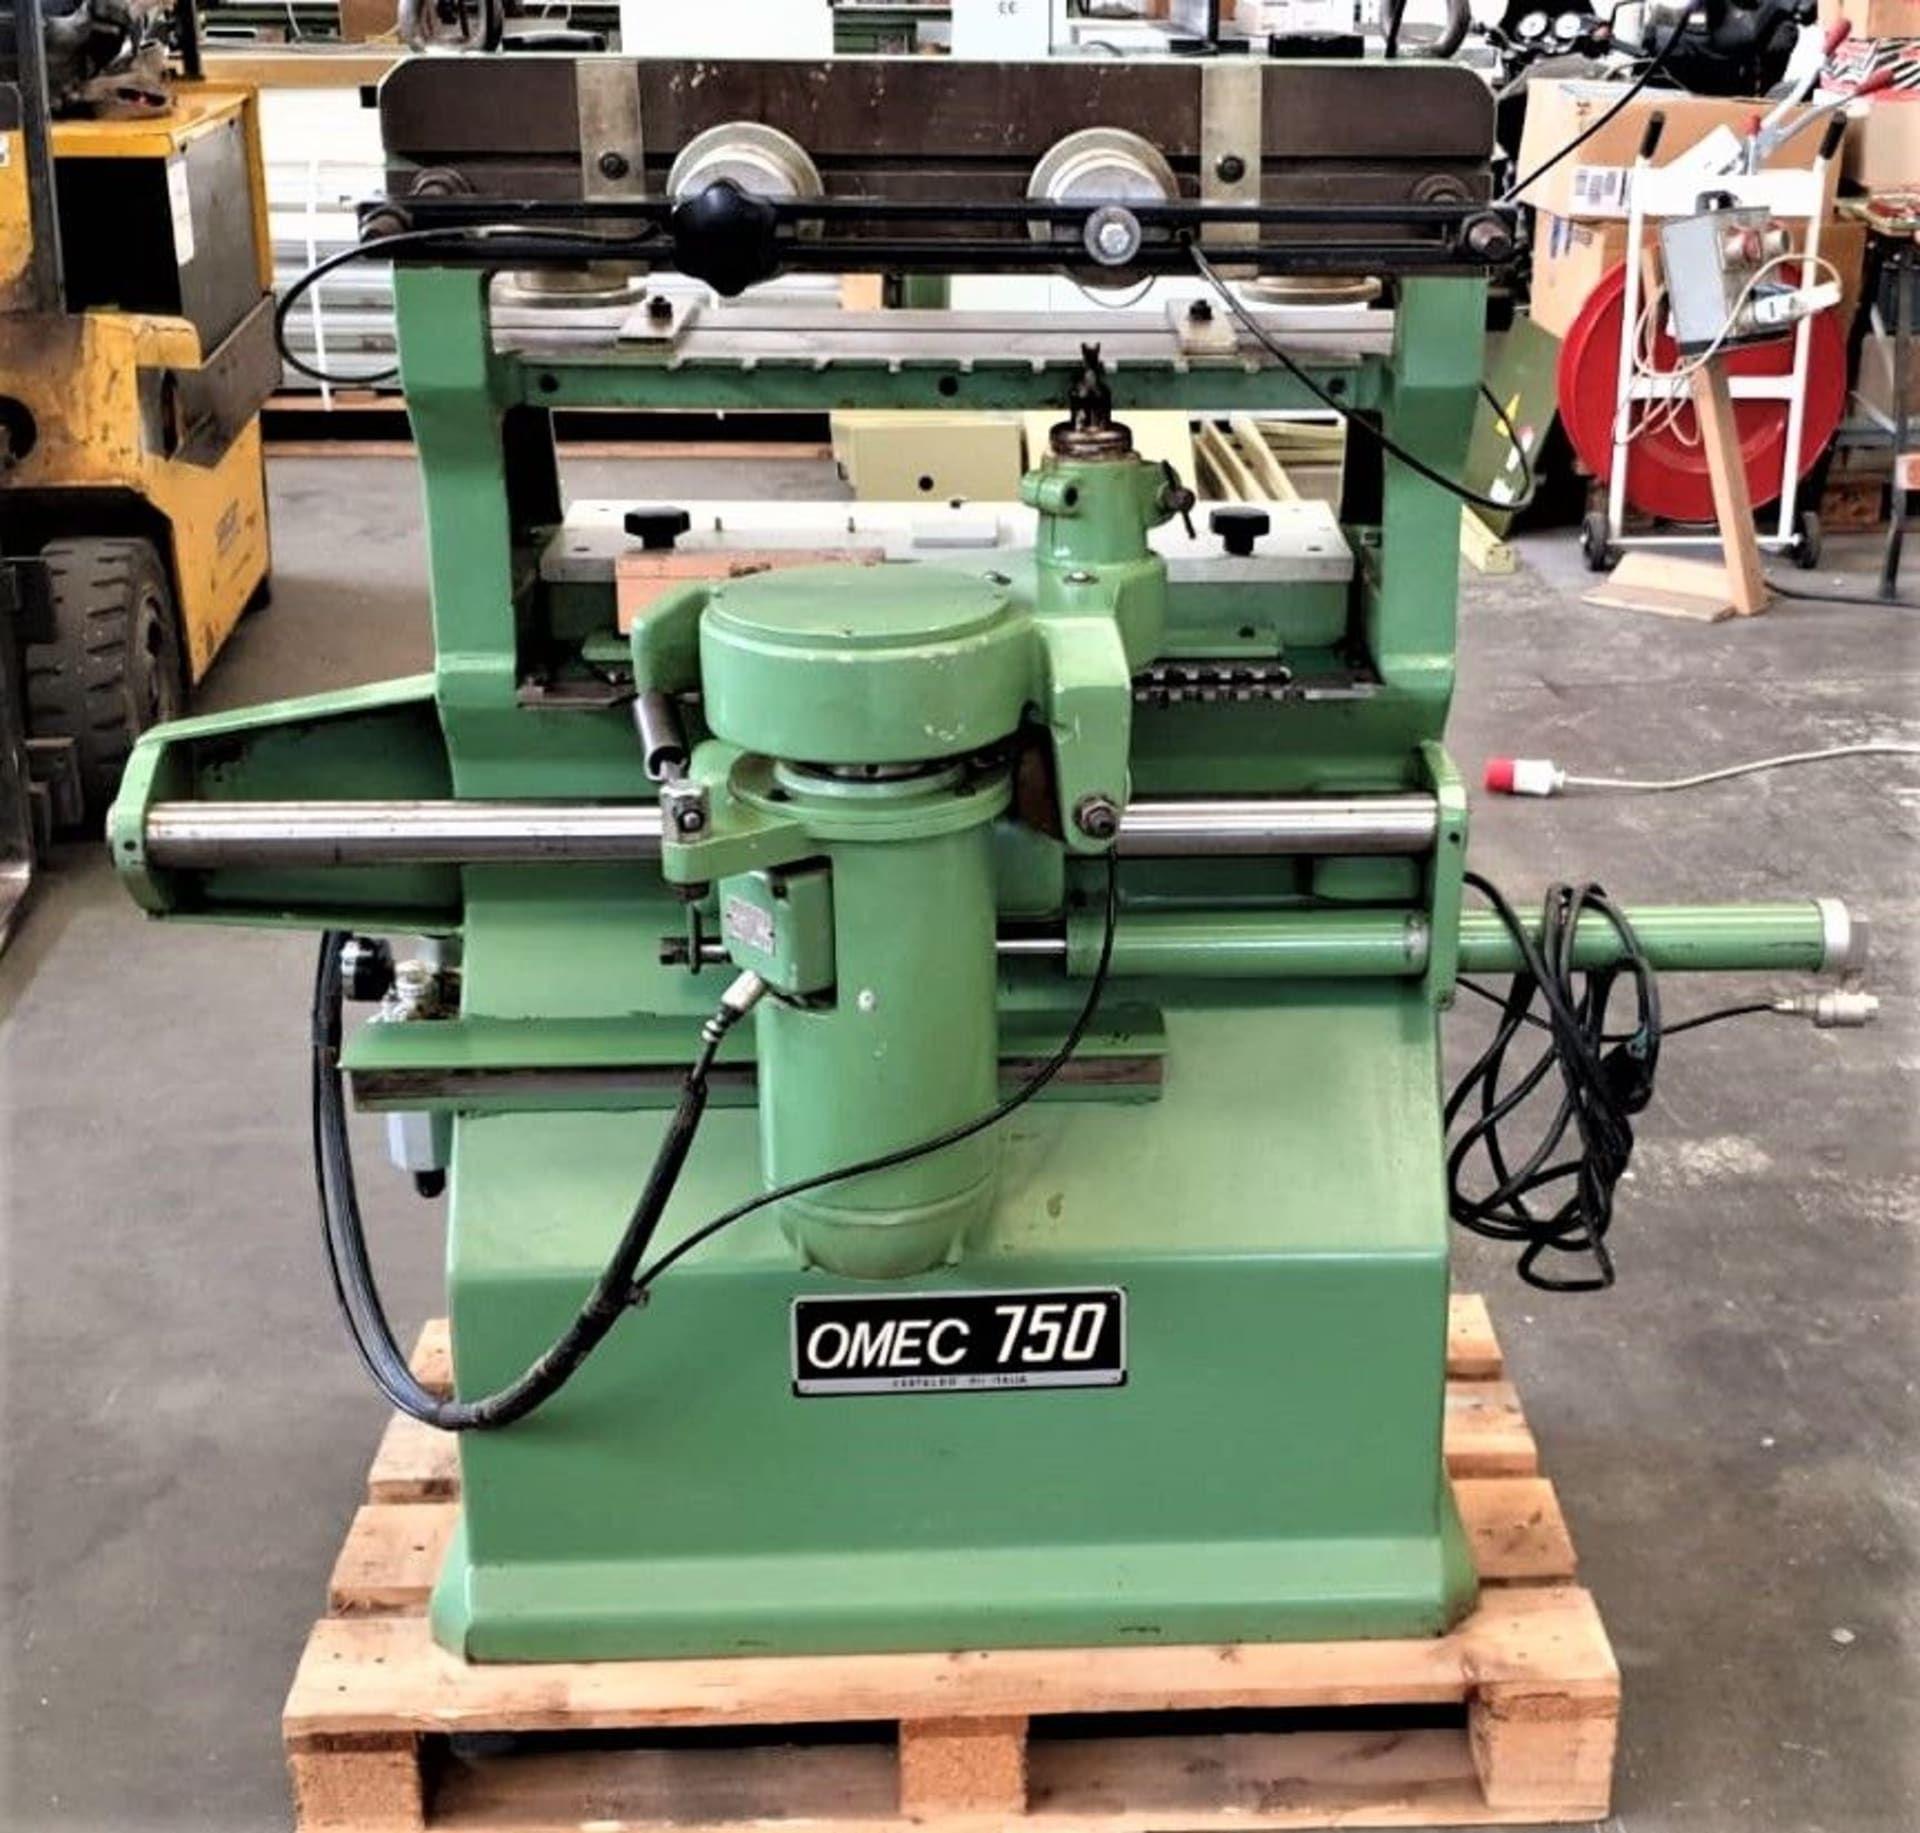 OMEC 750 Schubladen-Fräsmaschine